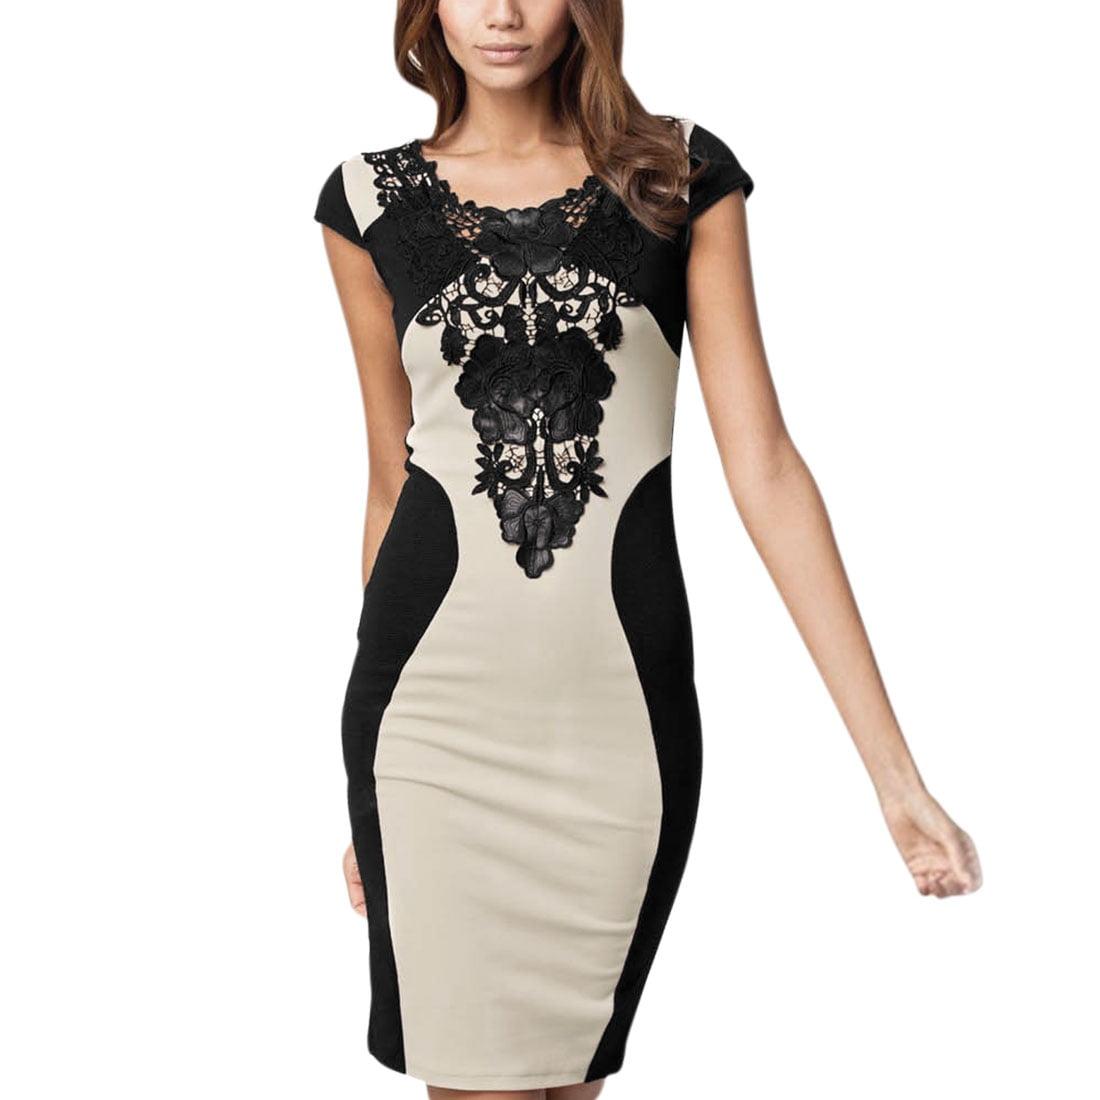 Woman's Crochet Embellished Short Sleeve Round Neck Pencil Dress Apricot Black M